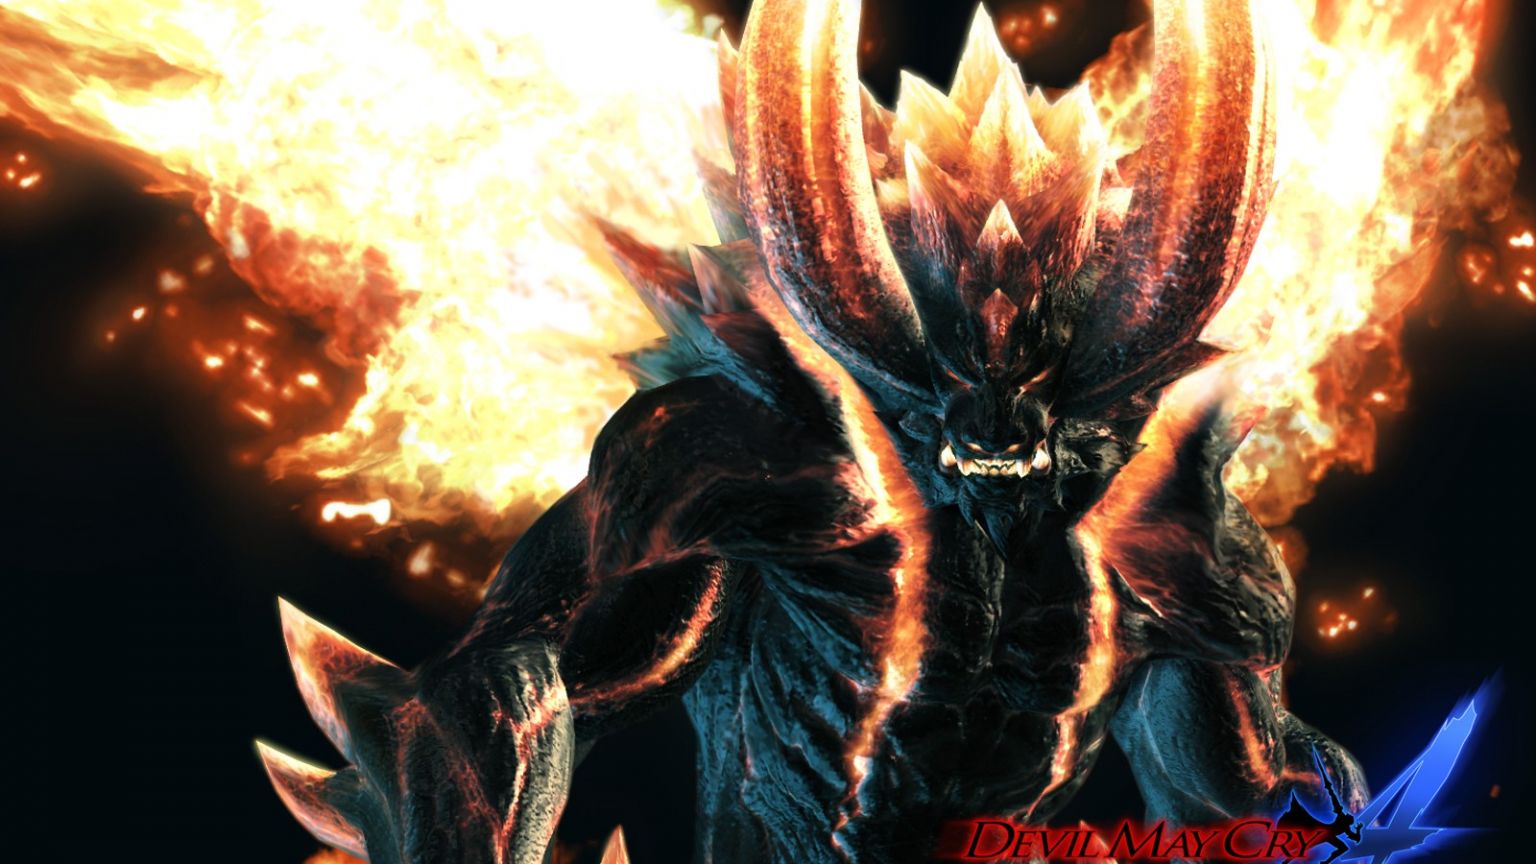 Free Download Devil May Cry 4 Wallpaper Wp20080229 6jpg 1600x1200